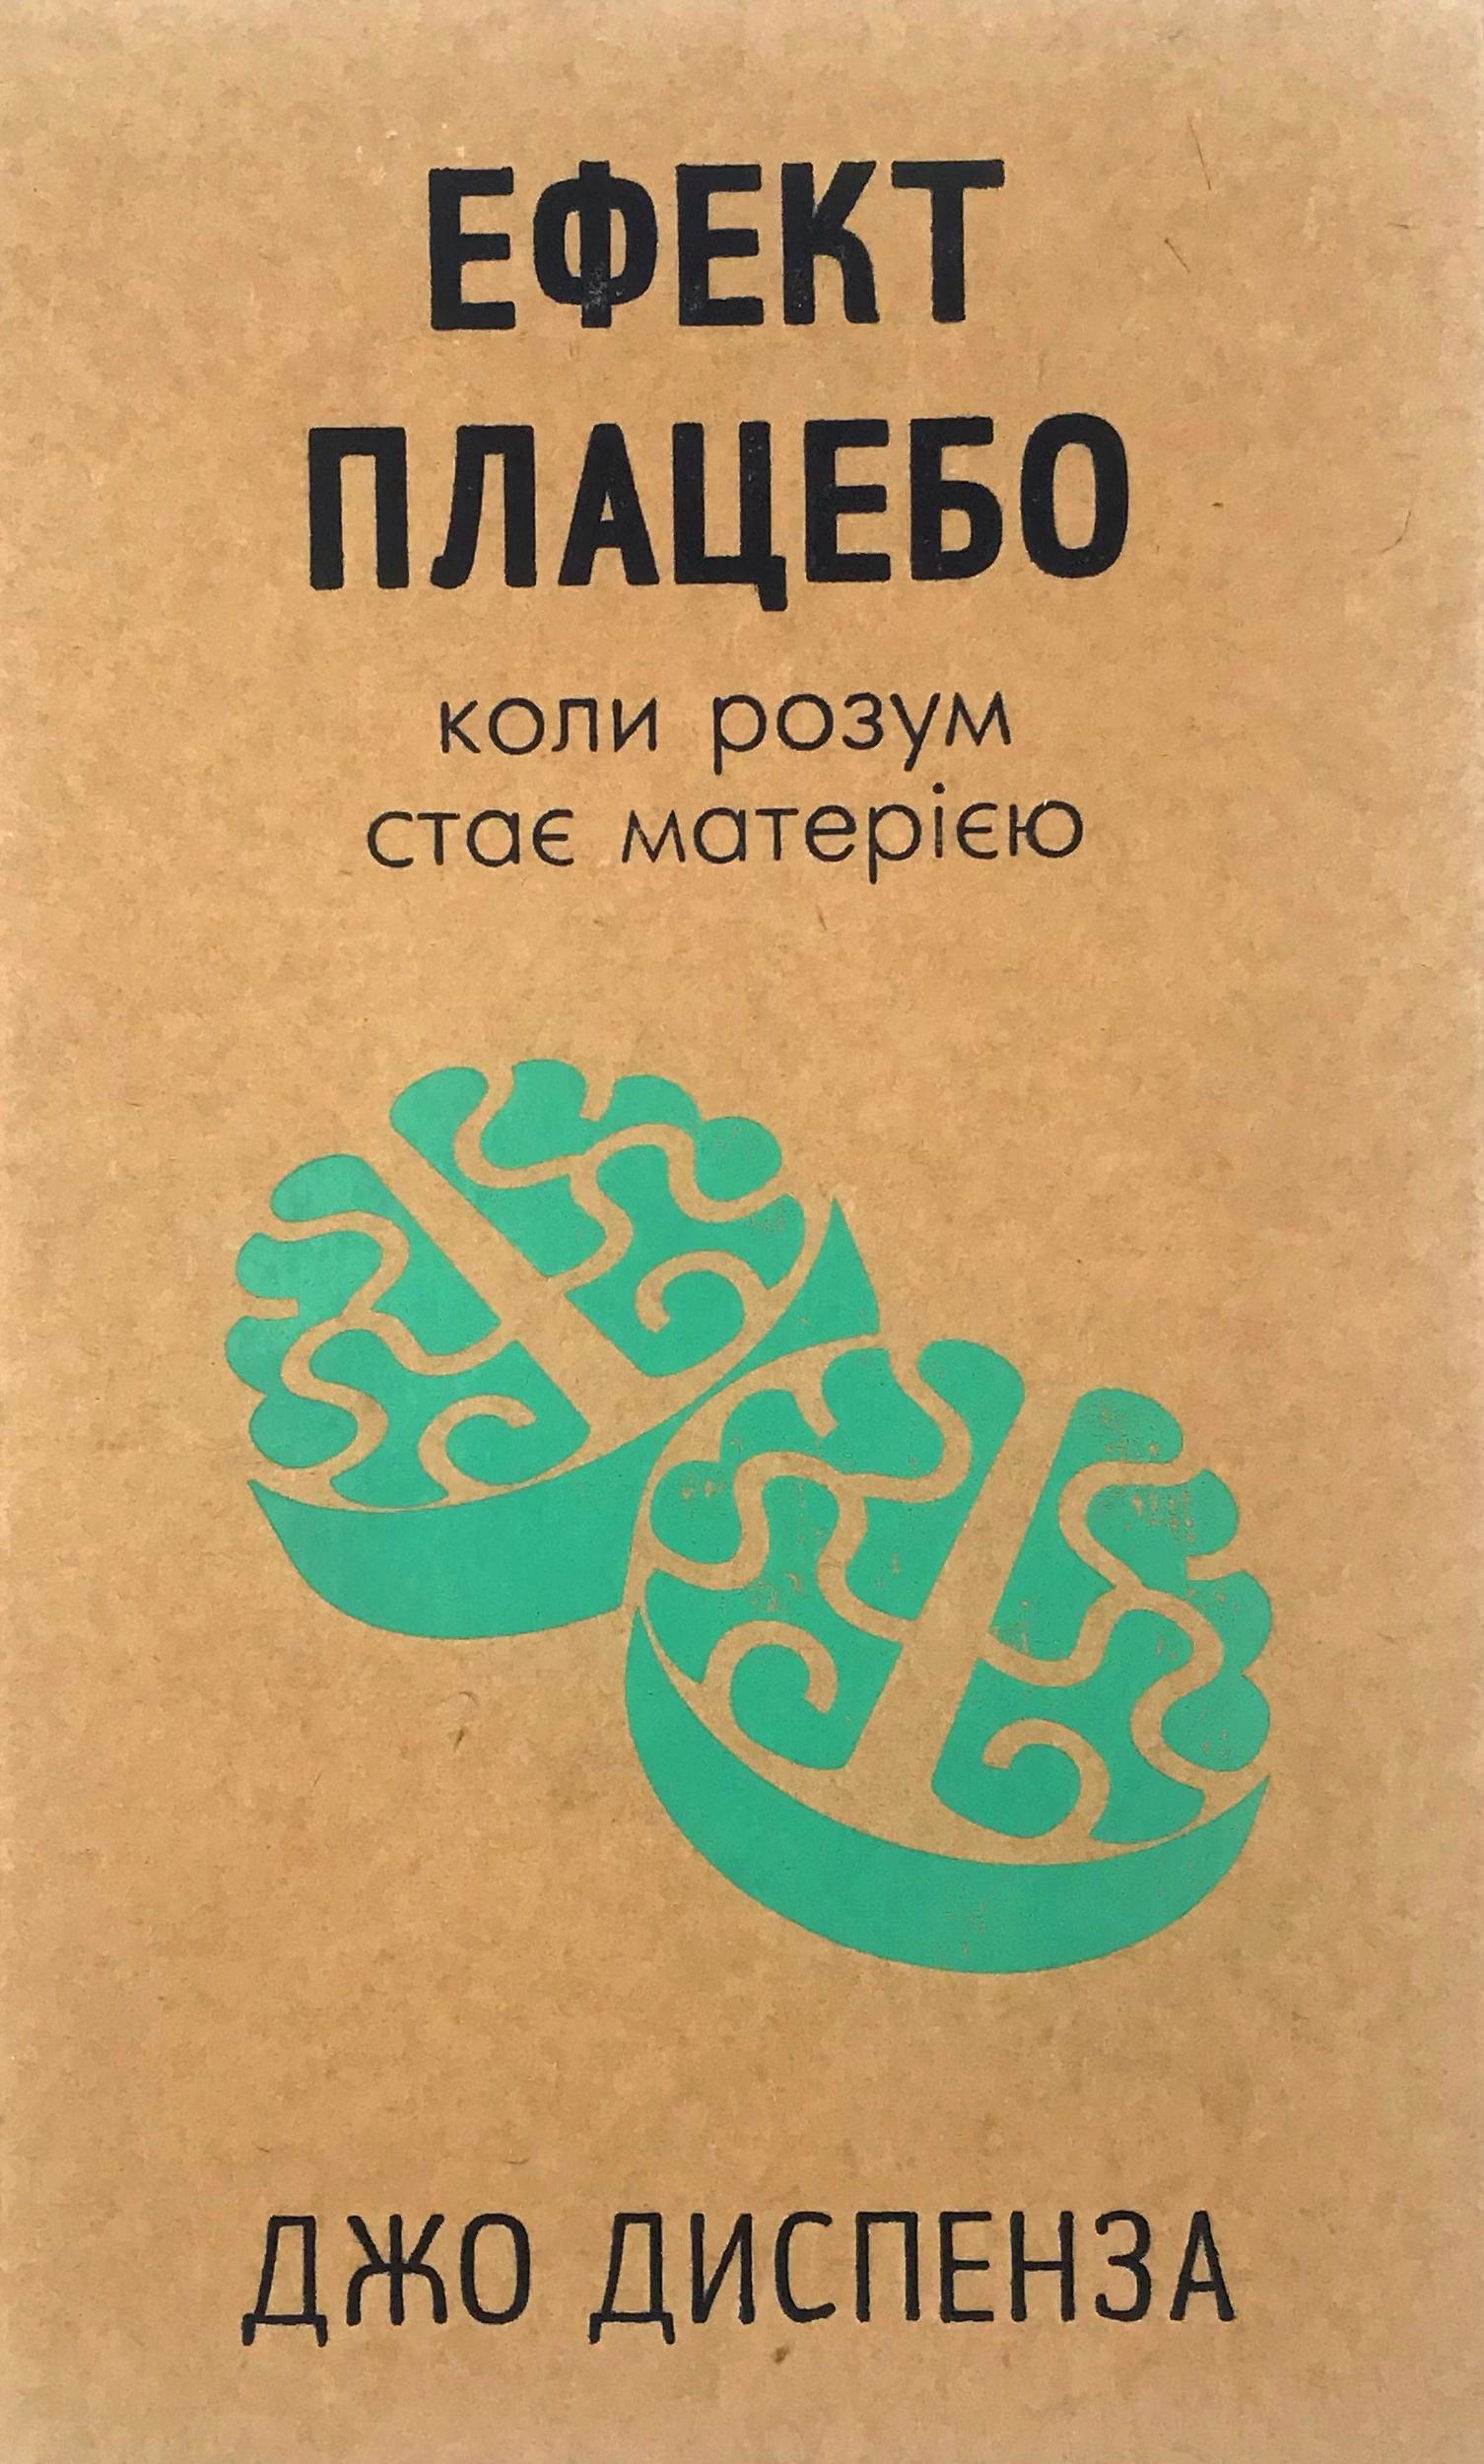 Ефект плацебо (2-ге видання)